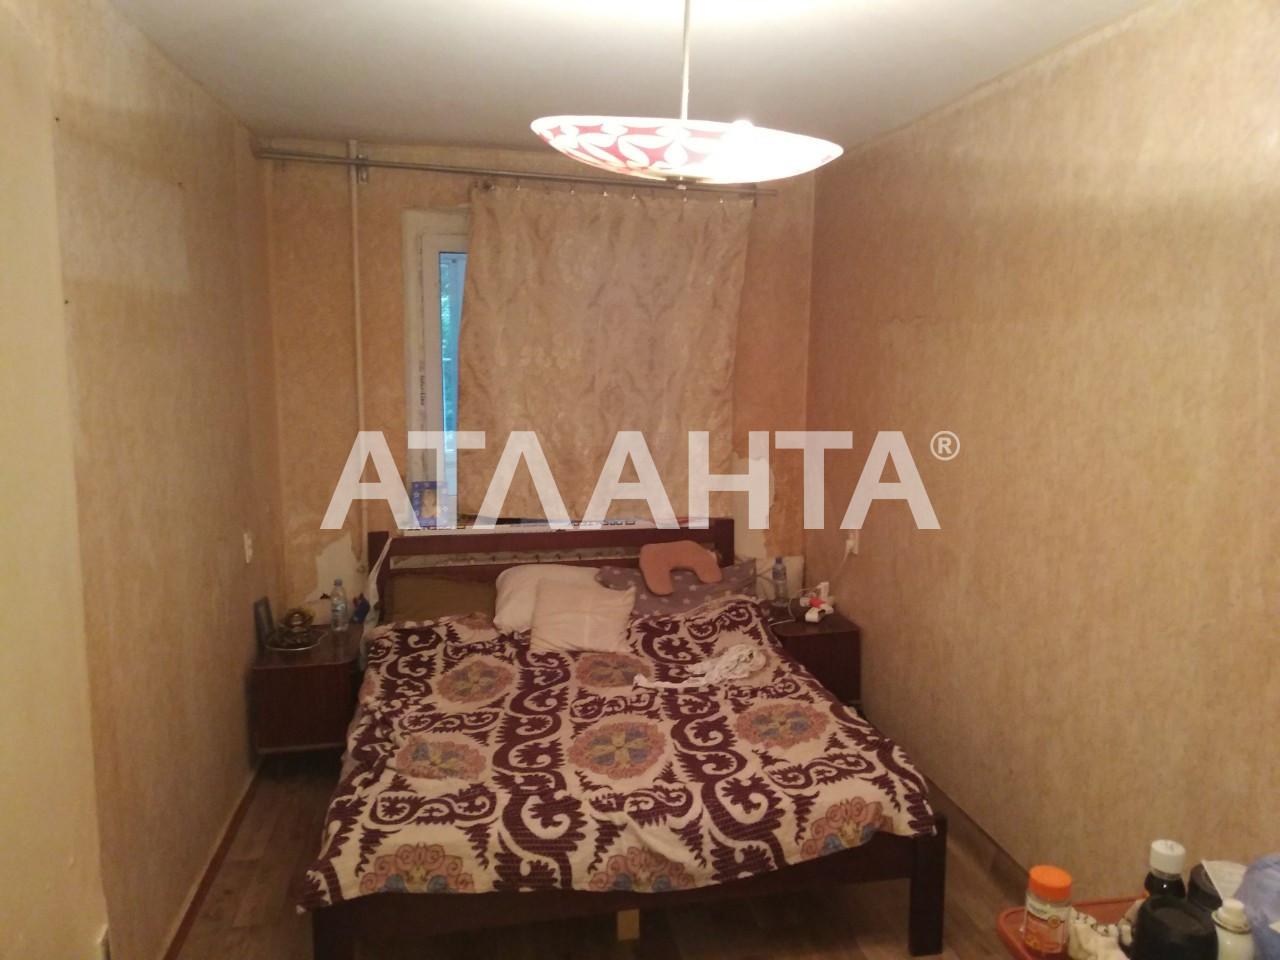 Продается 4-комнатная Квартира на ул. Малиновского Марш. — 43 000 у.е. (фото №9)